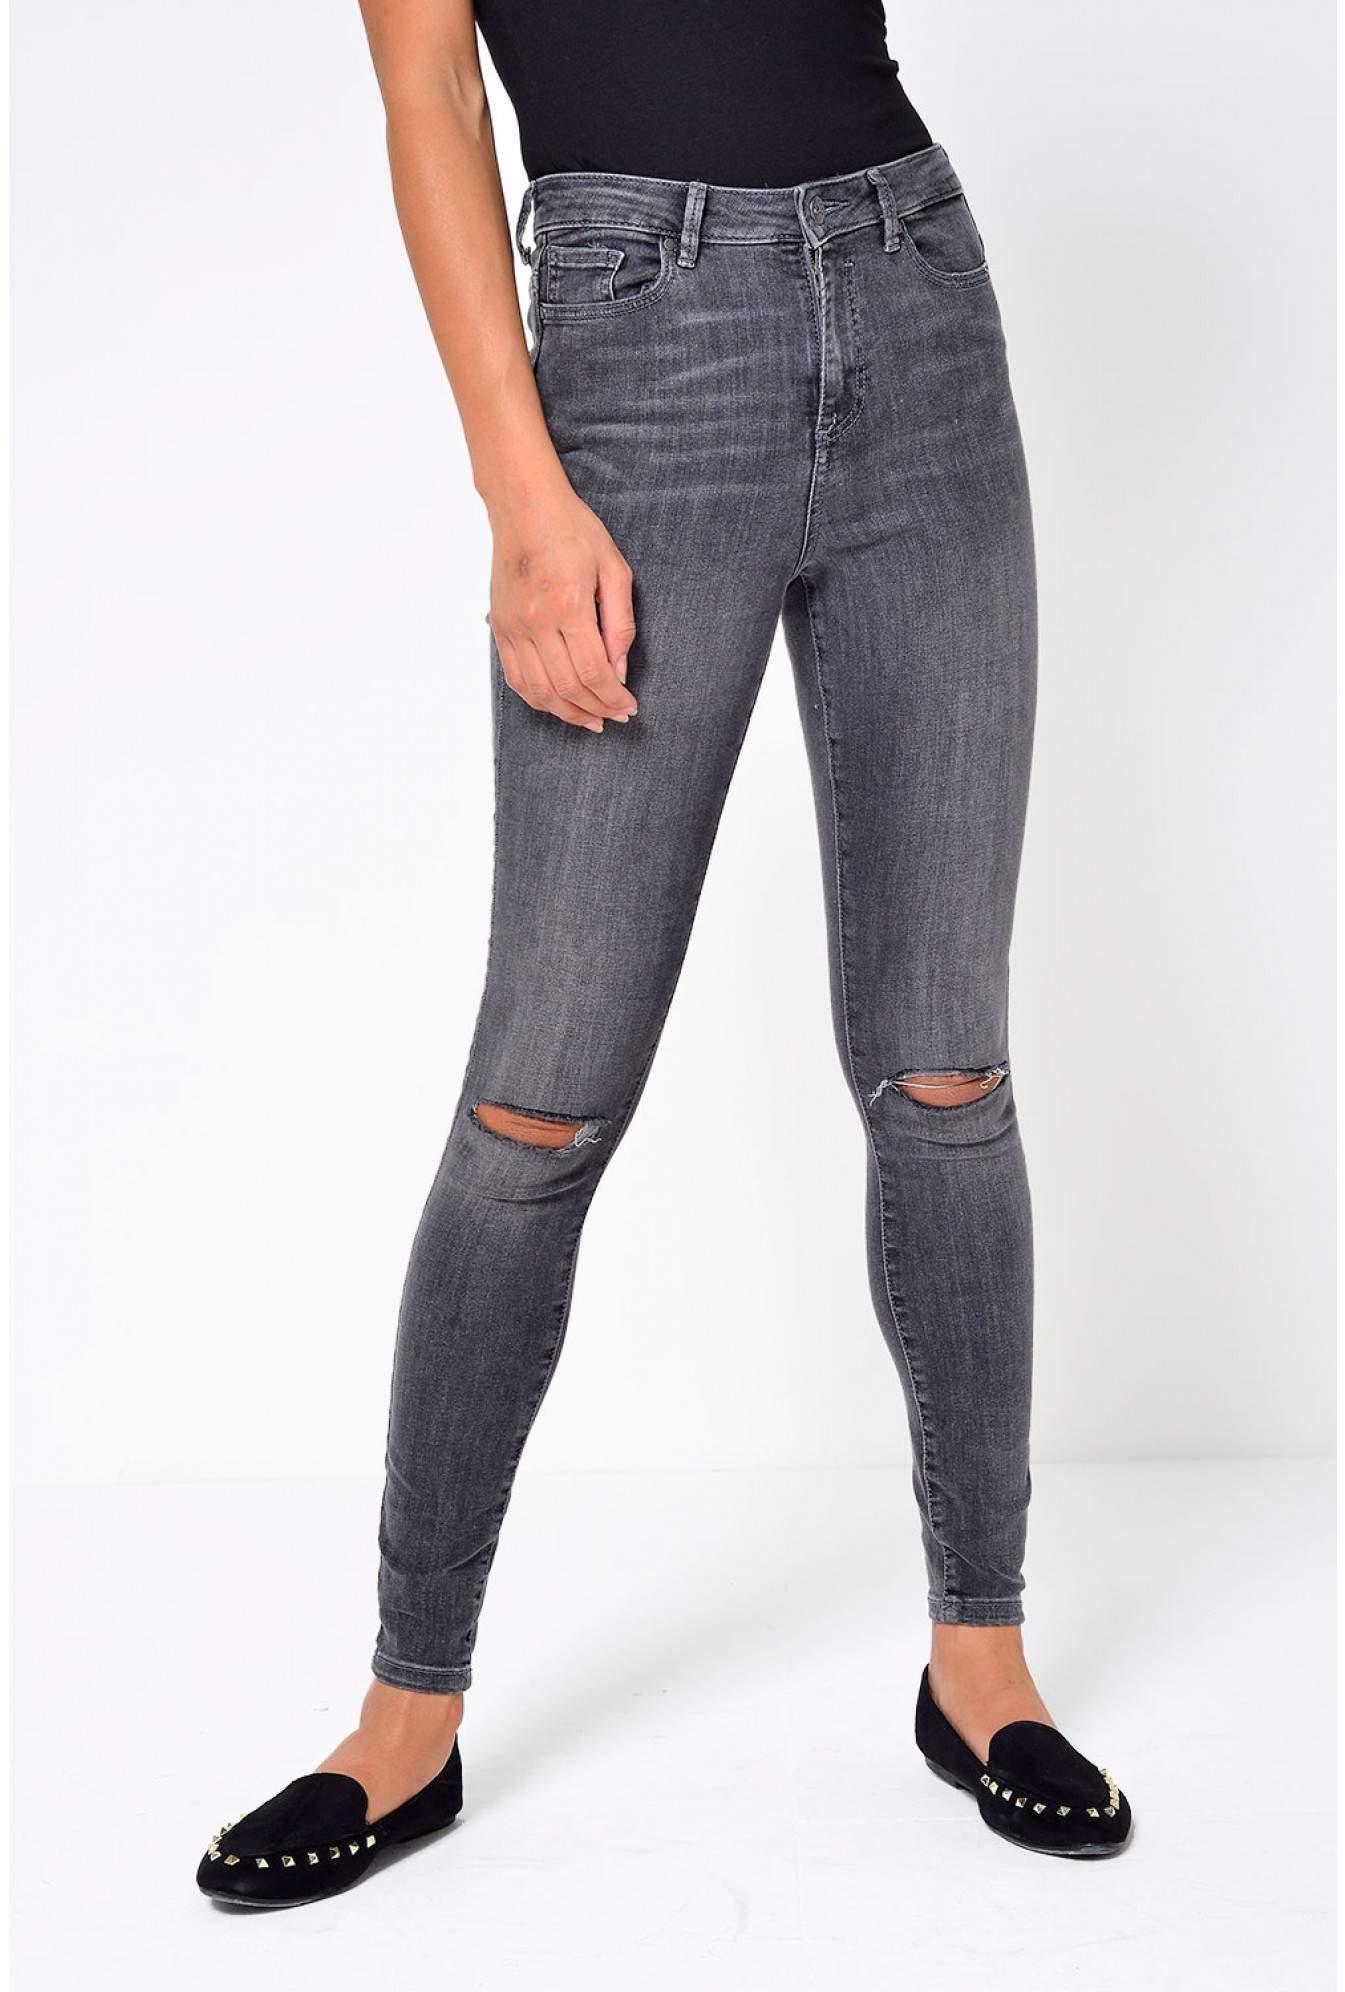 08220b5983 More Views. Sophia Regular High Waist Ripped Skinny Jean in Grey. Vero Moda